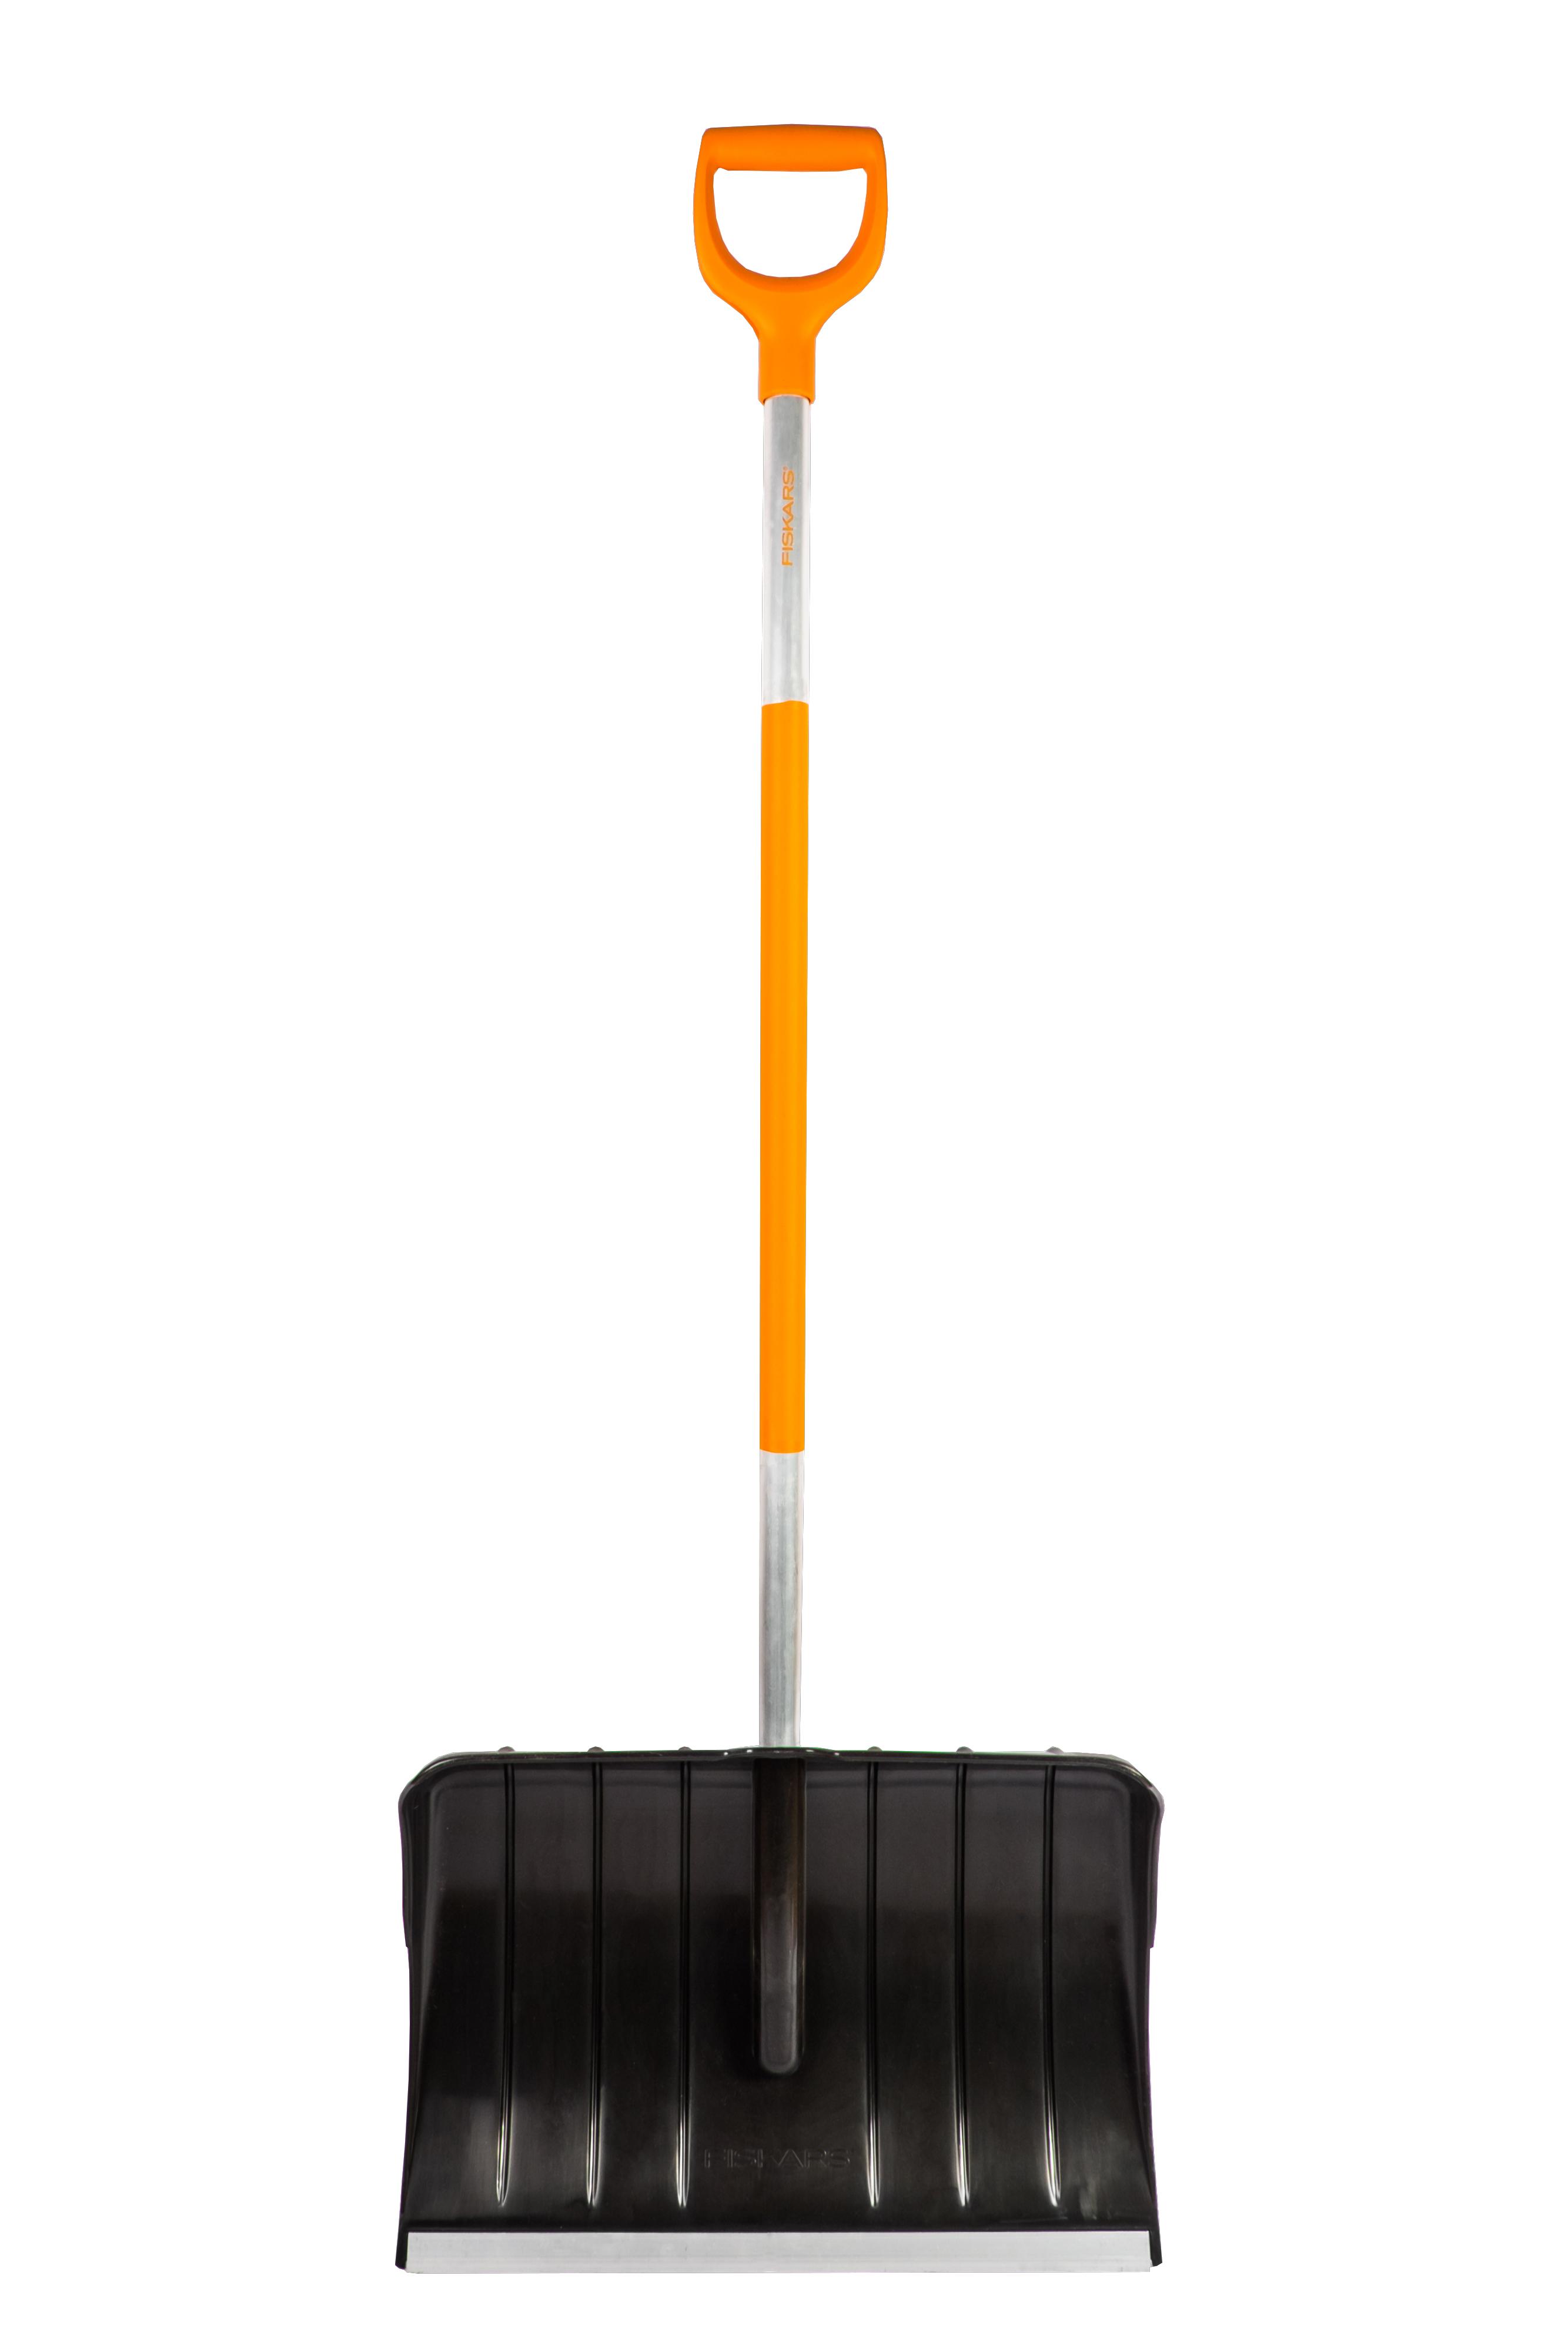 Скрепер Fiskars SnowXpert, для уборки снега скрепер для уборки снега fiskars snowxpert 143001